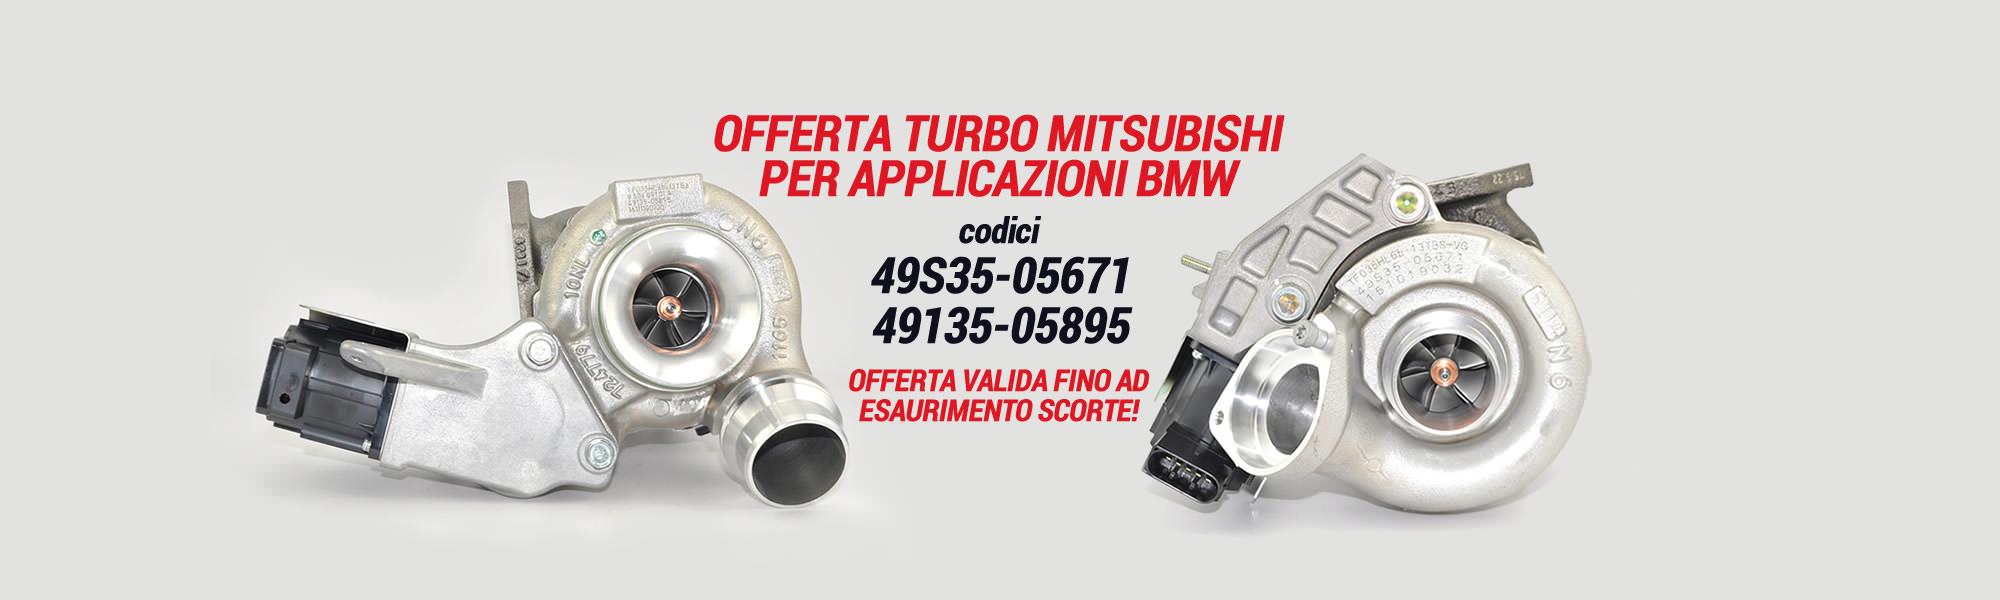 Offerta Turbo Mitsubishi per applicazioni BMW | SAITO